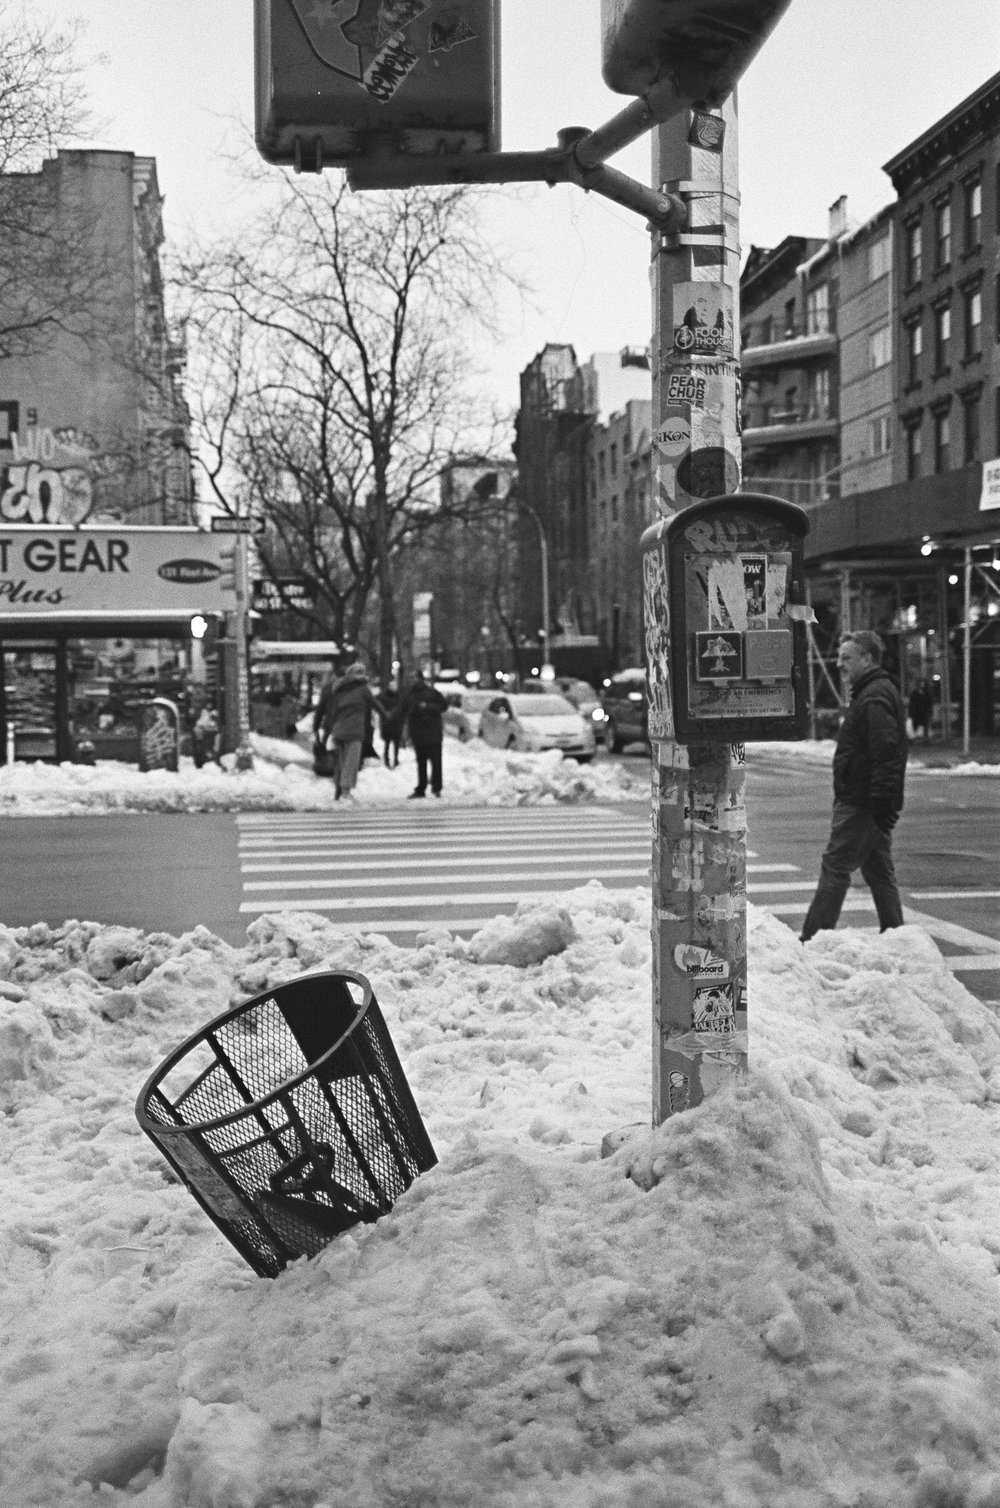 NYC Winter, 2017 Ilford HP5